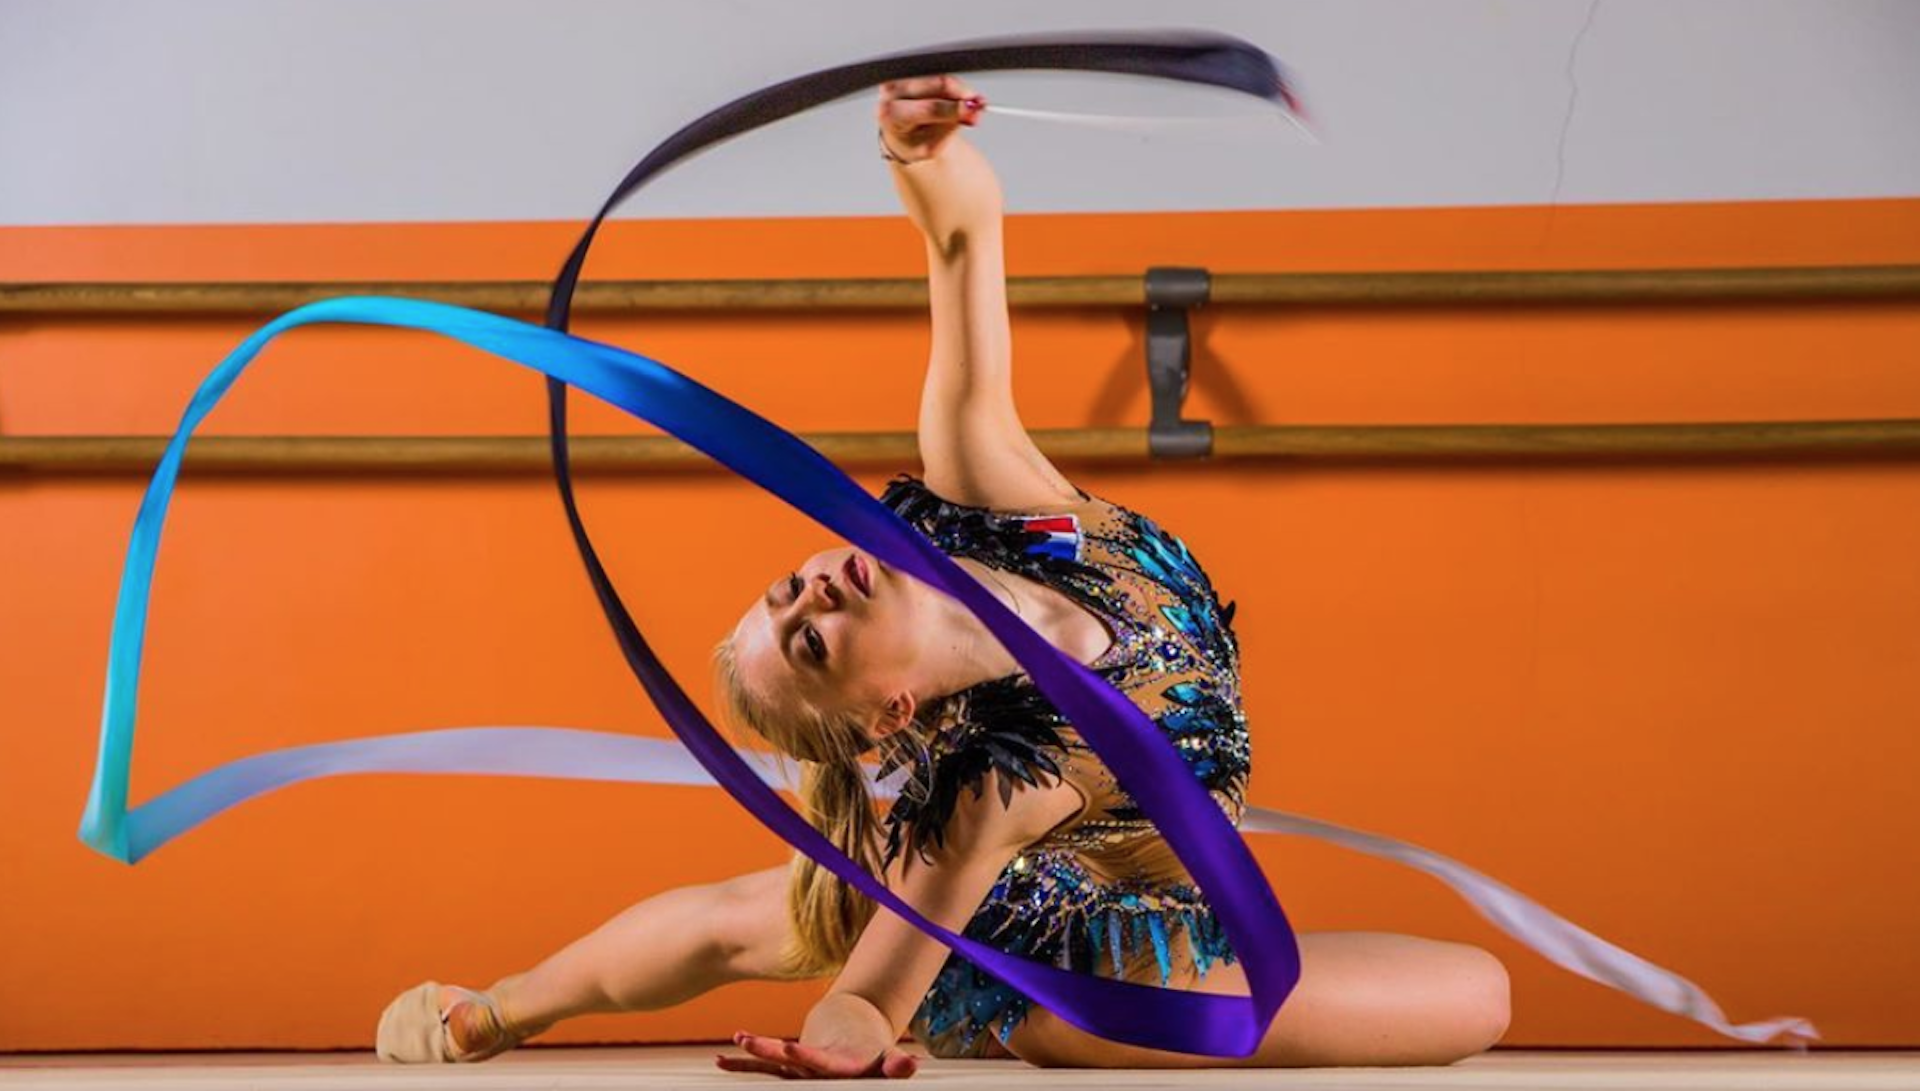 Beside Sport - Kseniya Moustafaeva, figure de la gymnastique rythmique en France -